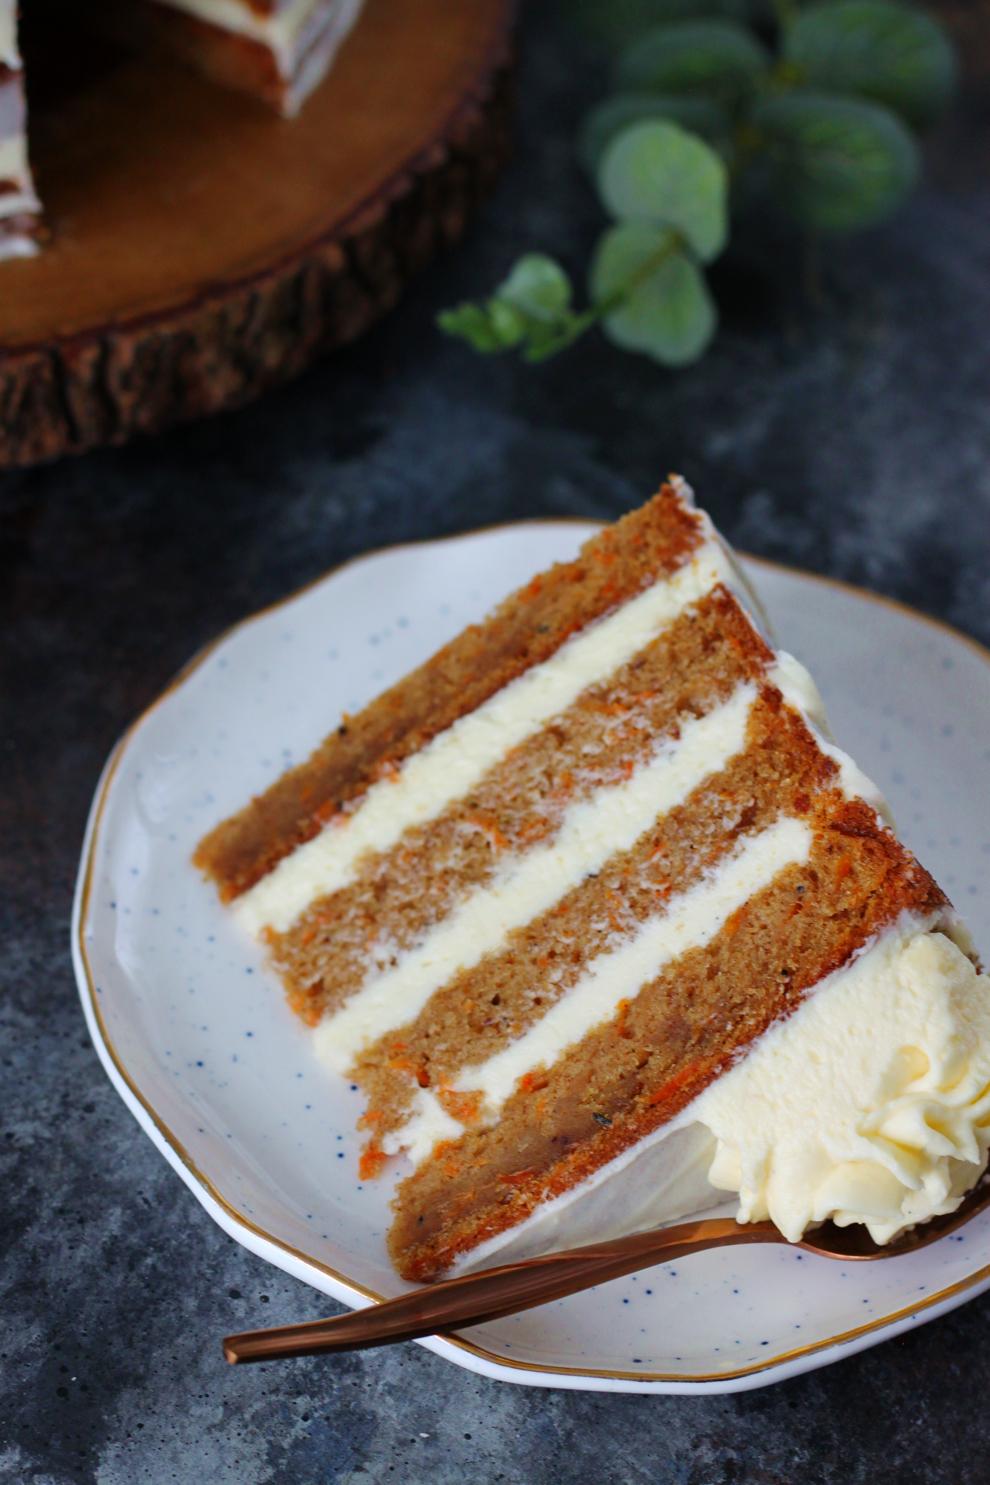 Cardamom Carrot Cake with Orange Blossom Frosting